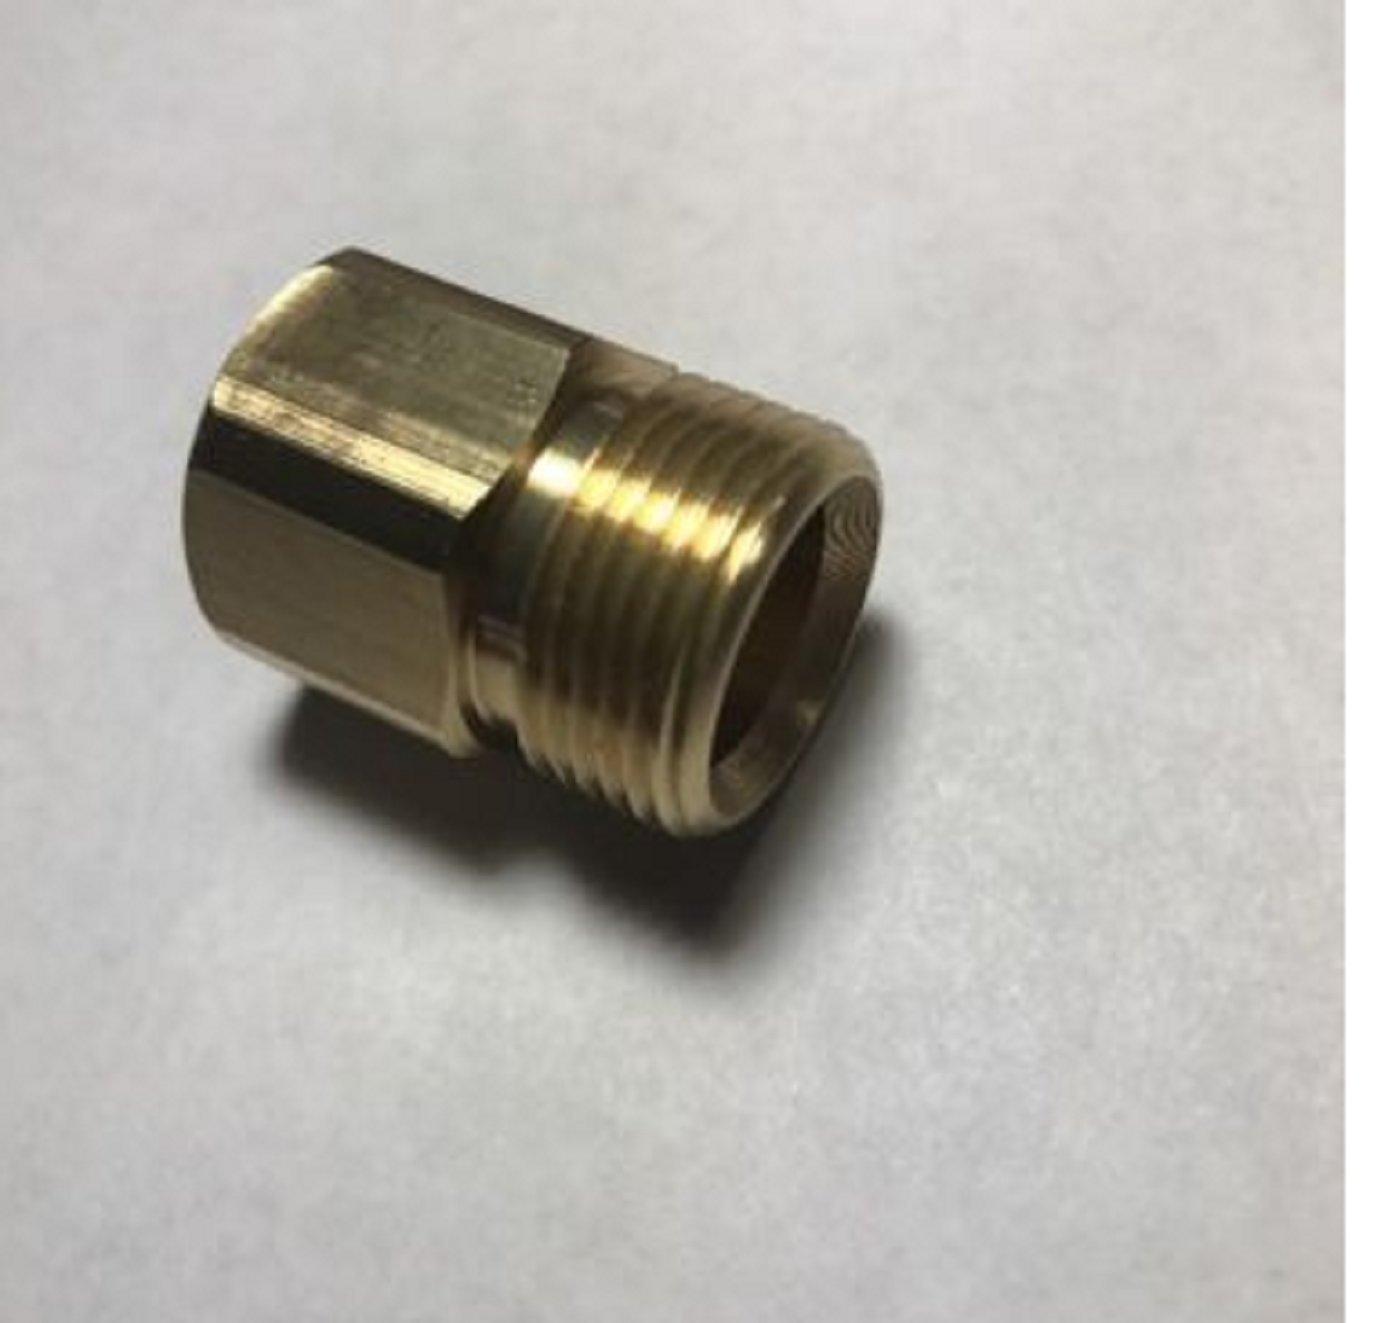 USA Premium Store M22 /15mm x 3/8 NPT Female Adapter (Non Standard size M22)